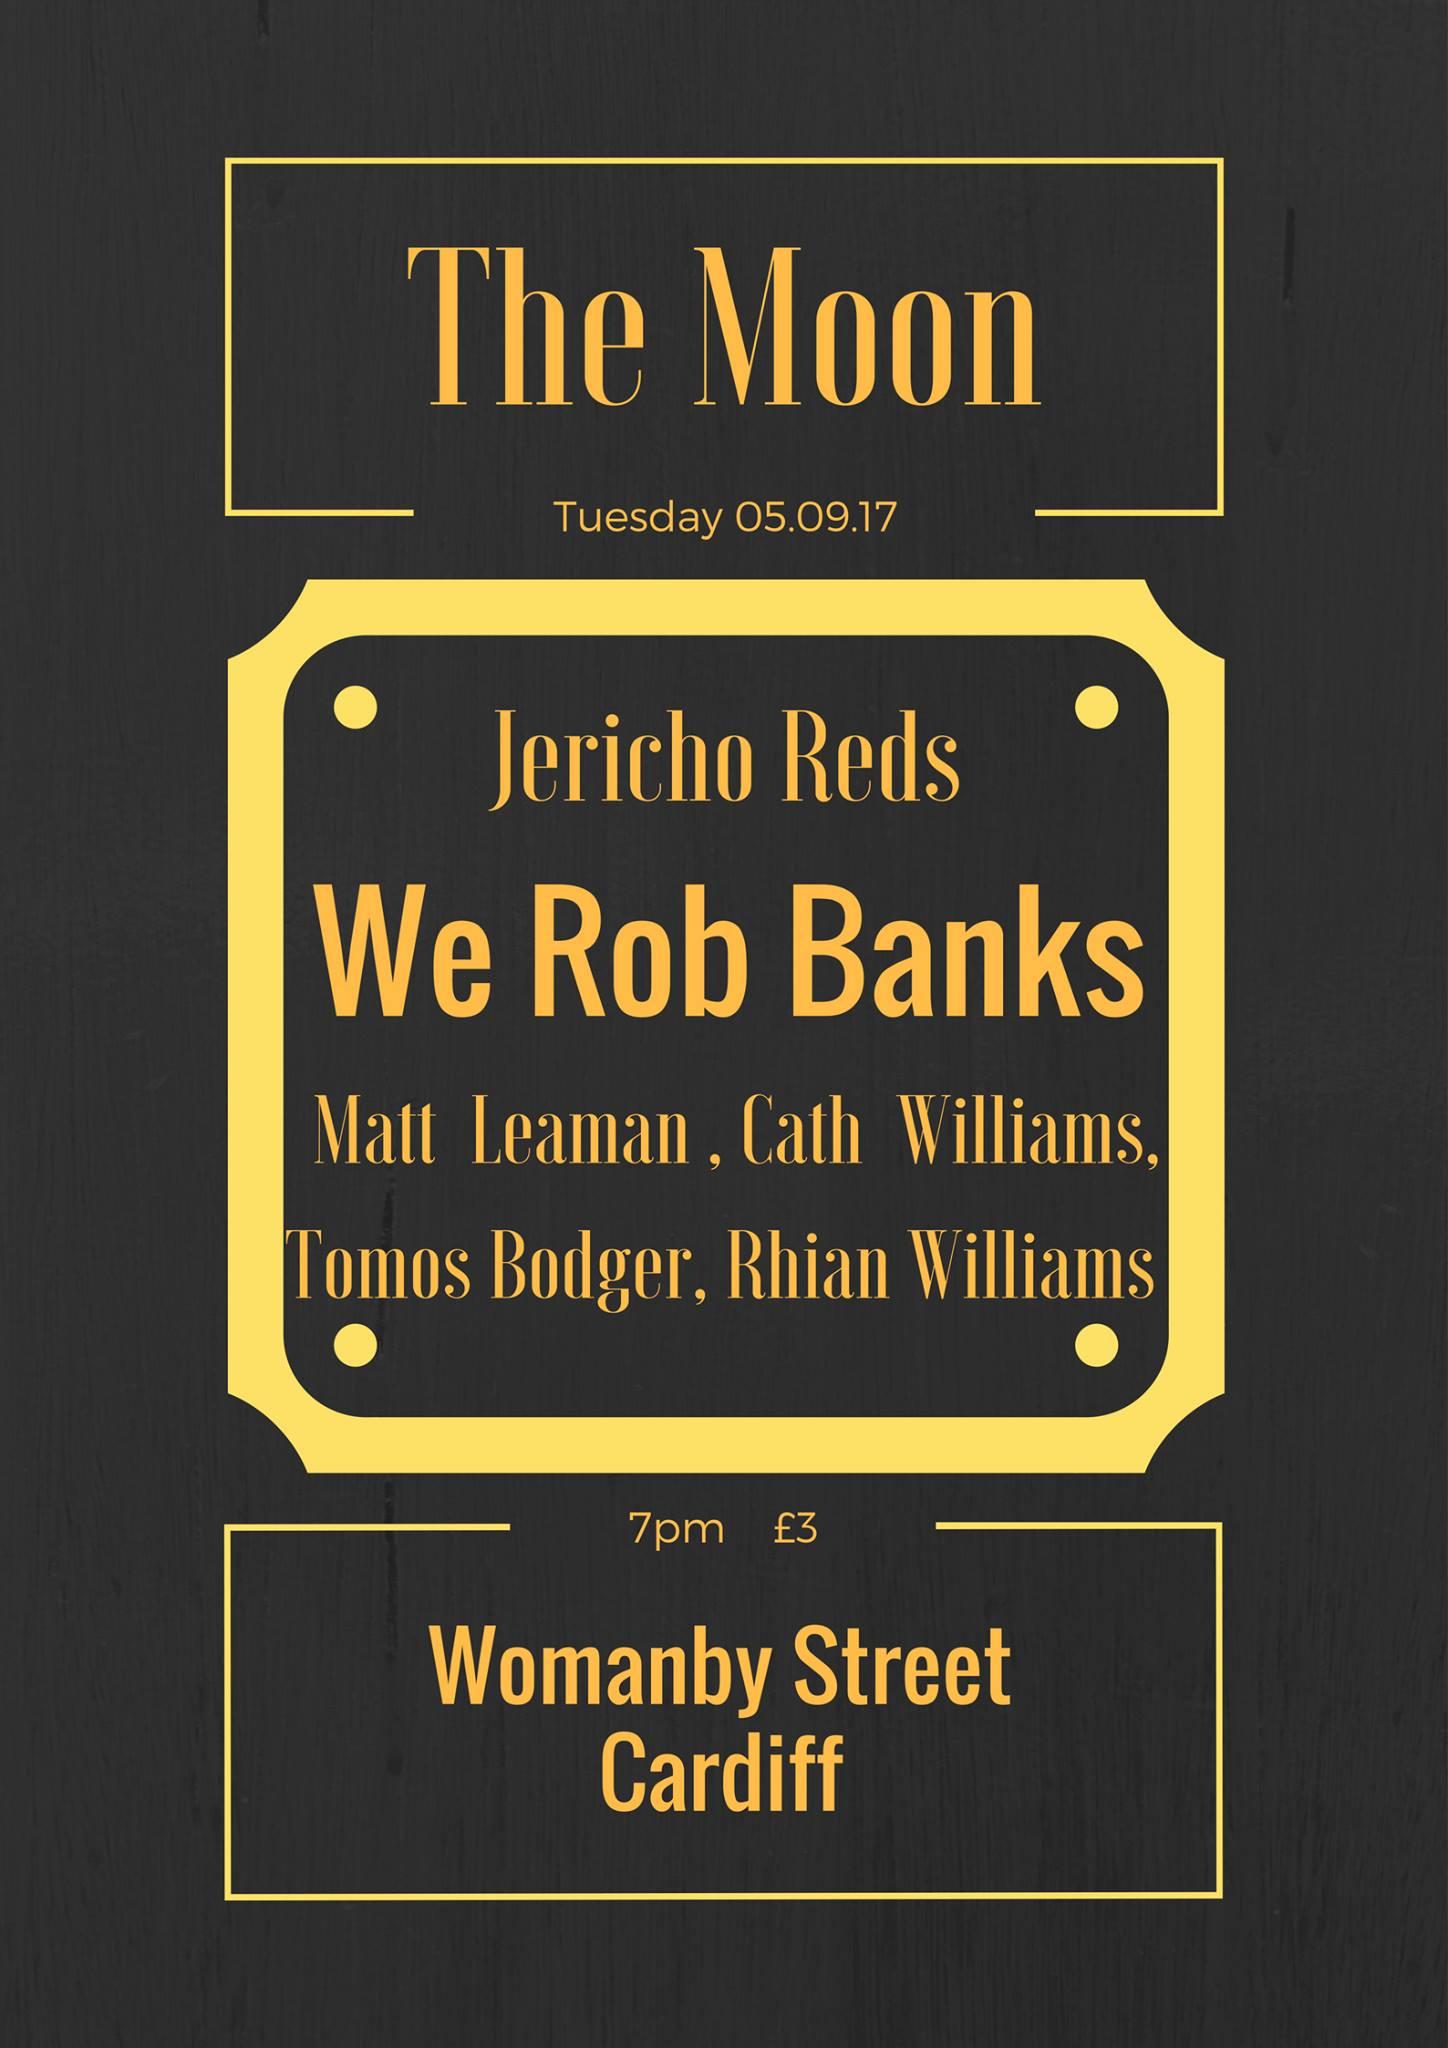 We Rob Banks fundraiser